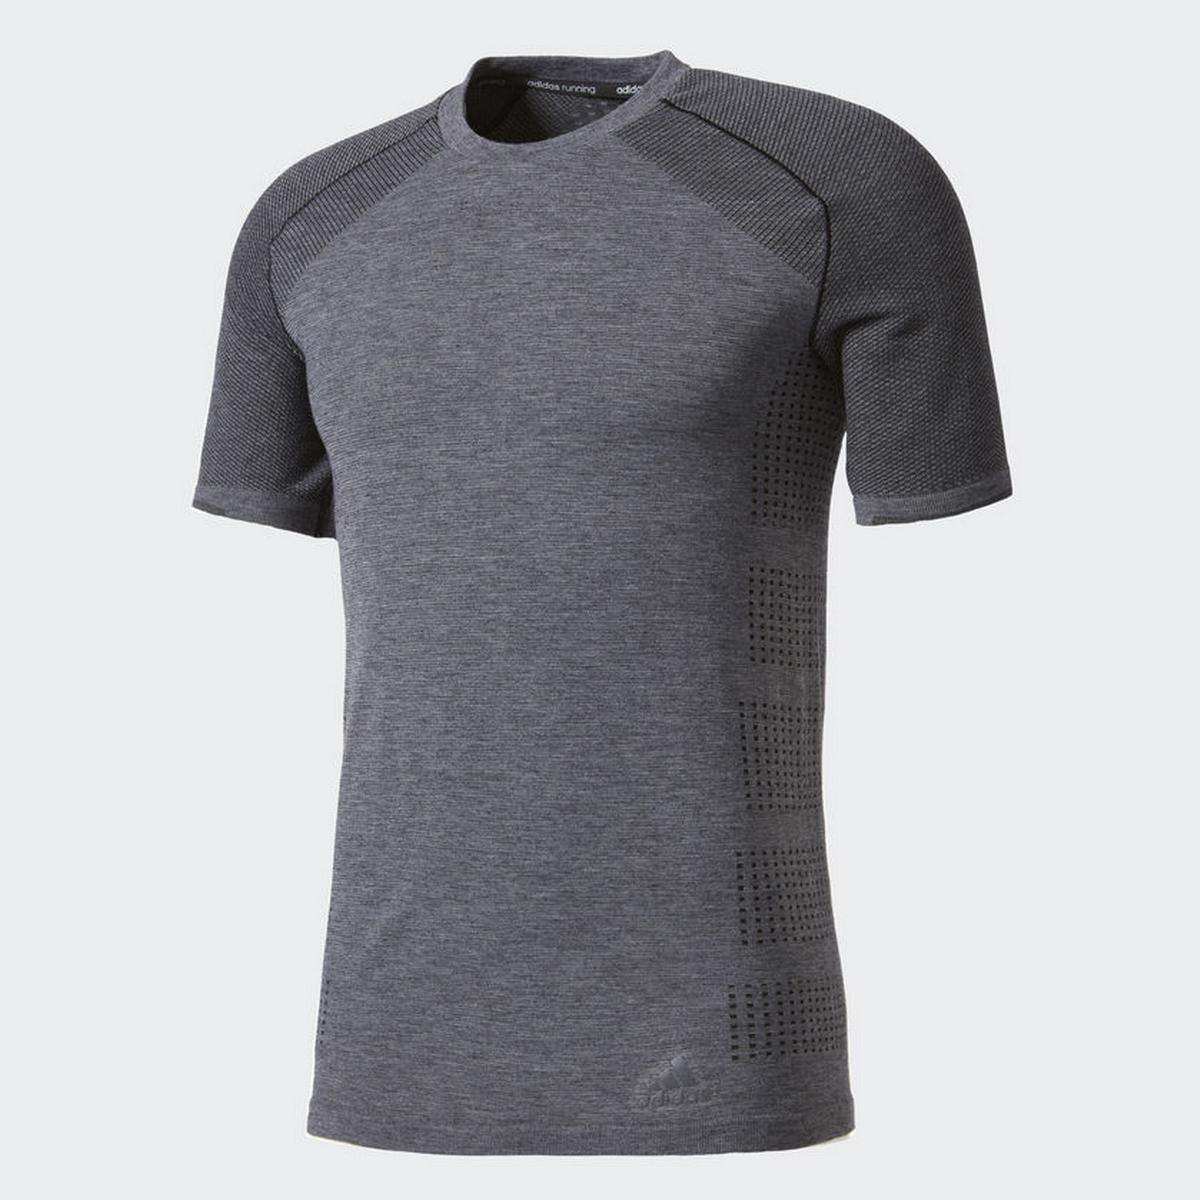 Adidas Uld Sportstøj Sammenlign priser hos PriceRunner